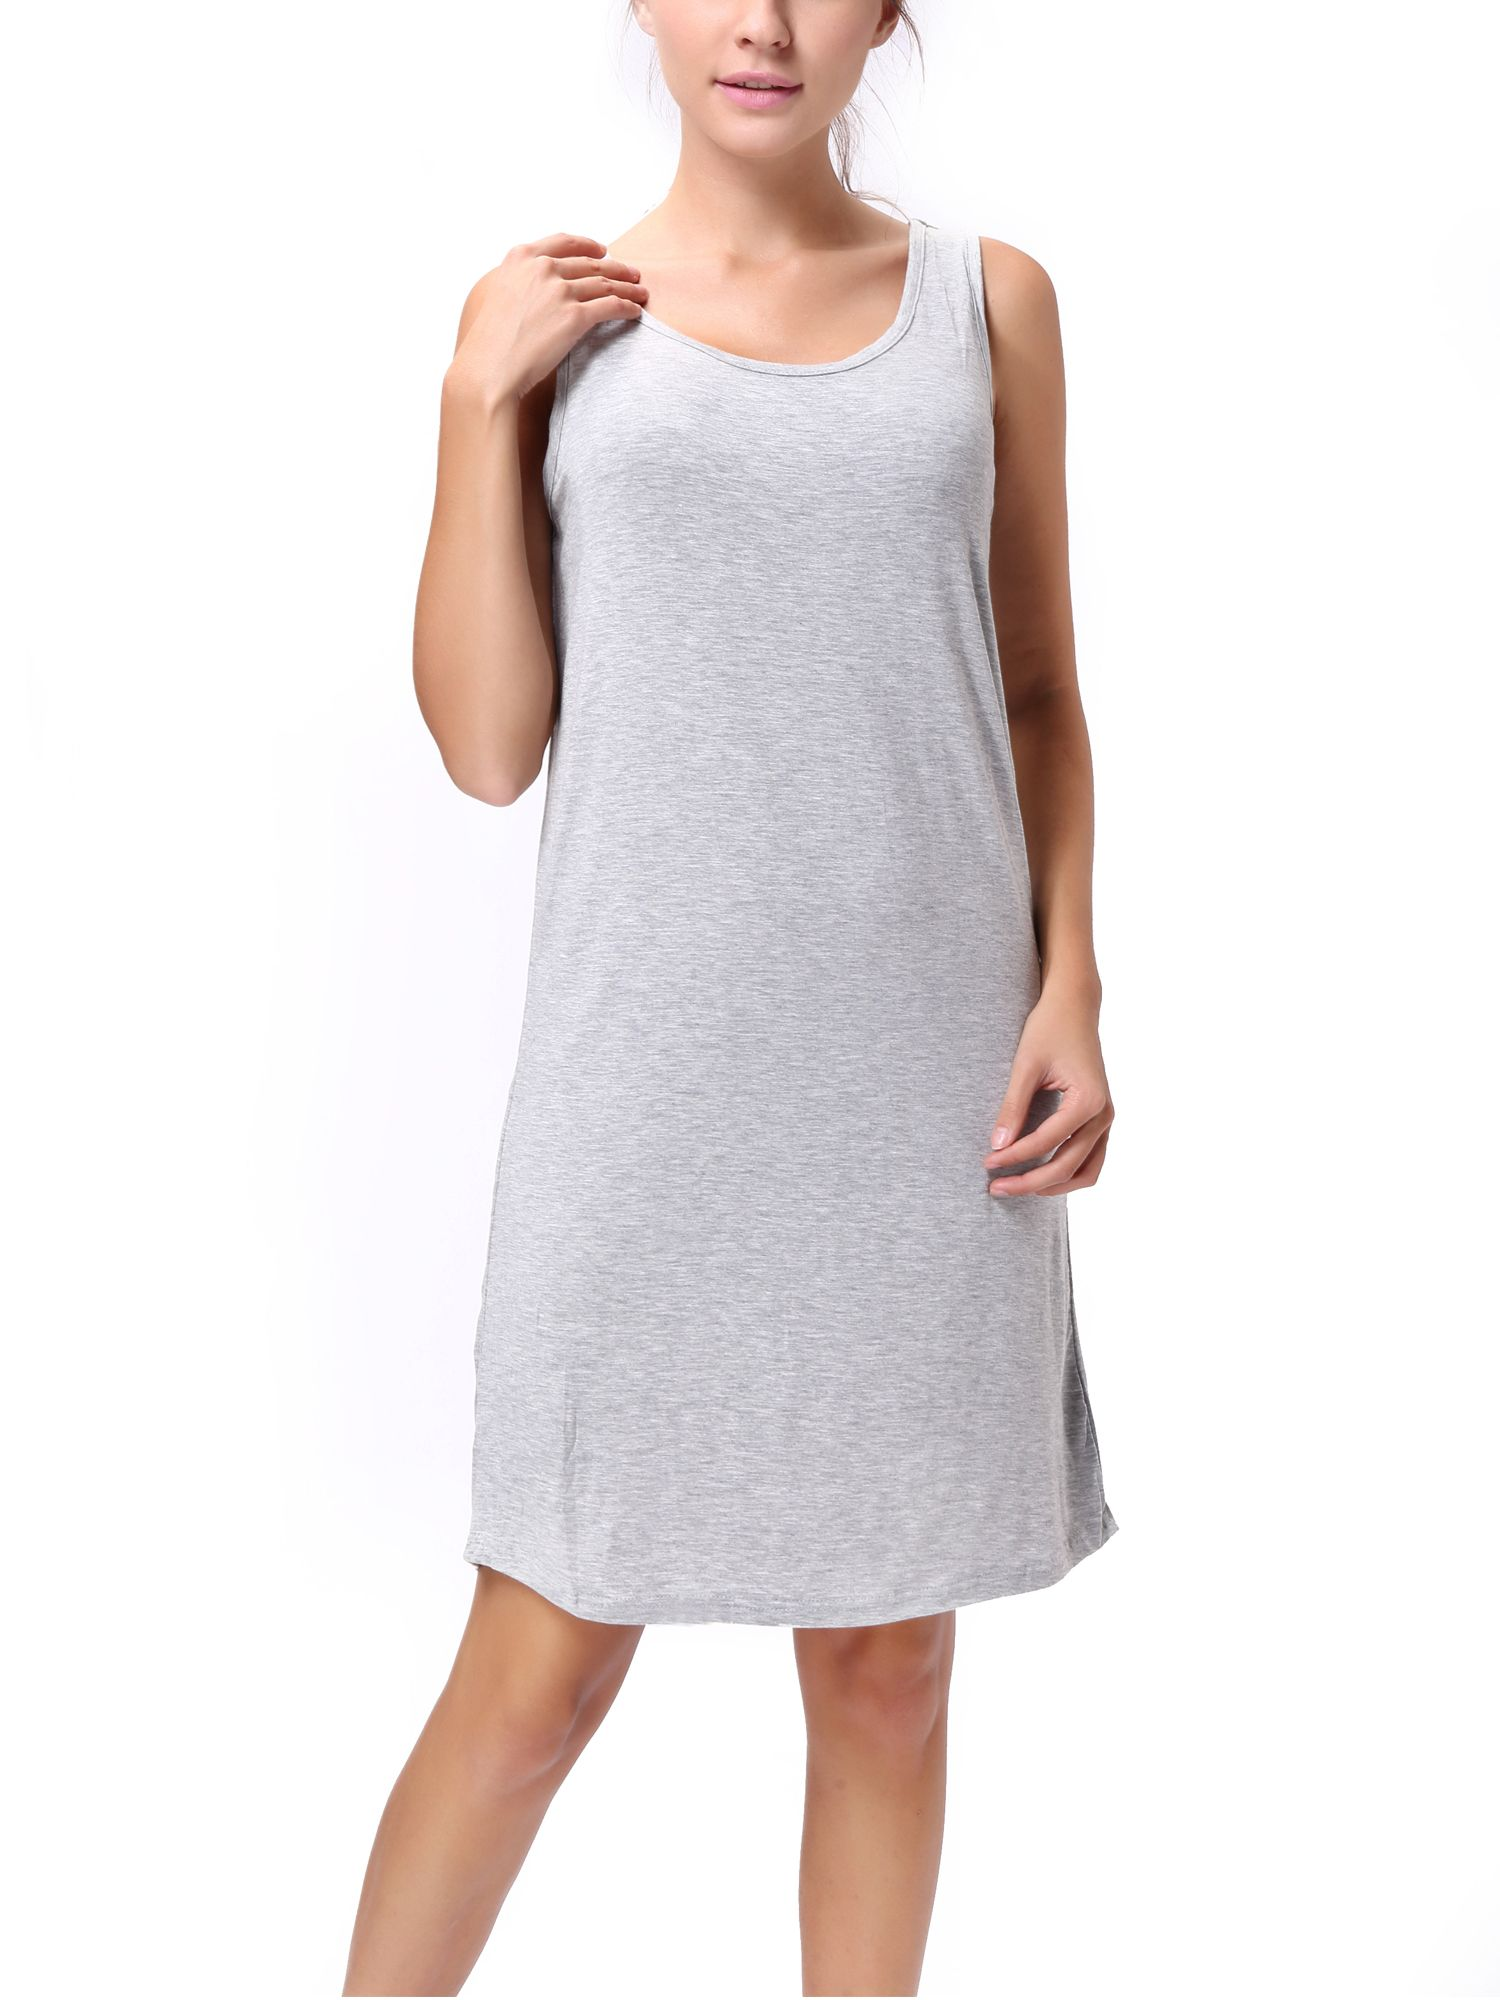 Sayfut Sayfut Women S Beach Casual Tank Tops Dress Modal Cotton Knee Length Sundresses Stretchy Slim Fit Vest Dresses Black Gray Walmart Com Sleeveless Long Dress Casual Tank Tops Spring Outfits Casual [ 2000 x 1500 Pixel ]